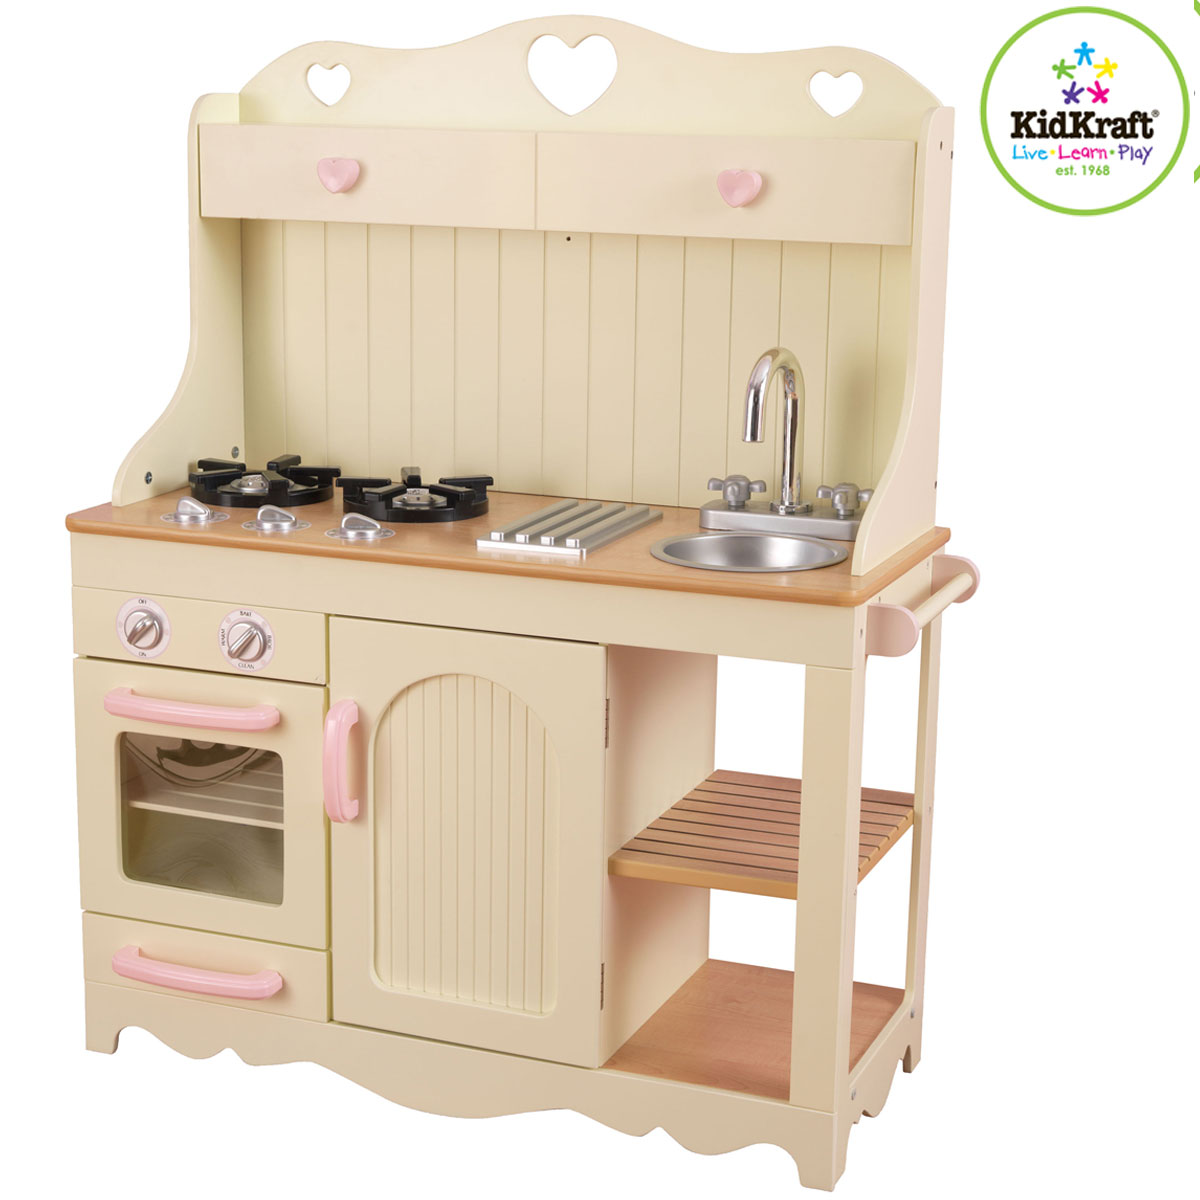 KidKraft Kinderküche Spielküche Prärie aus Holz